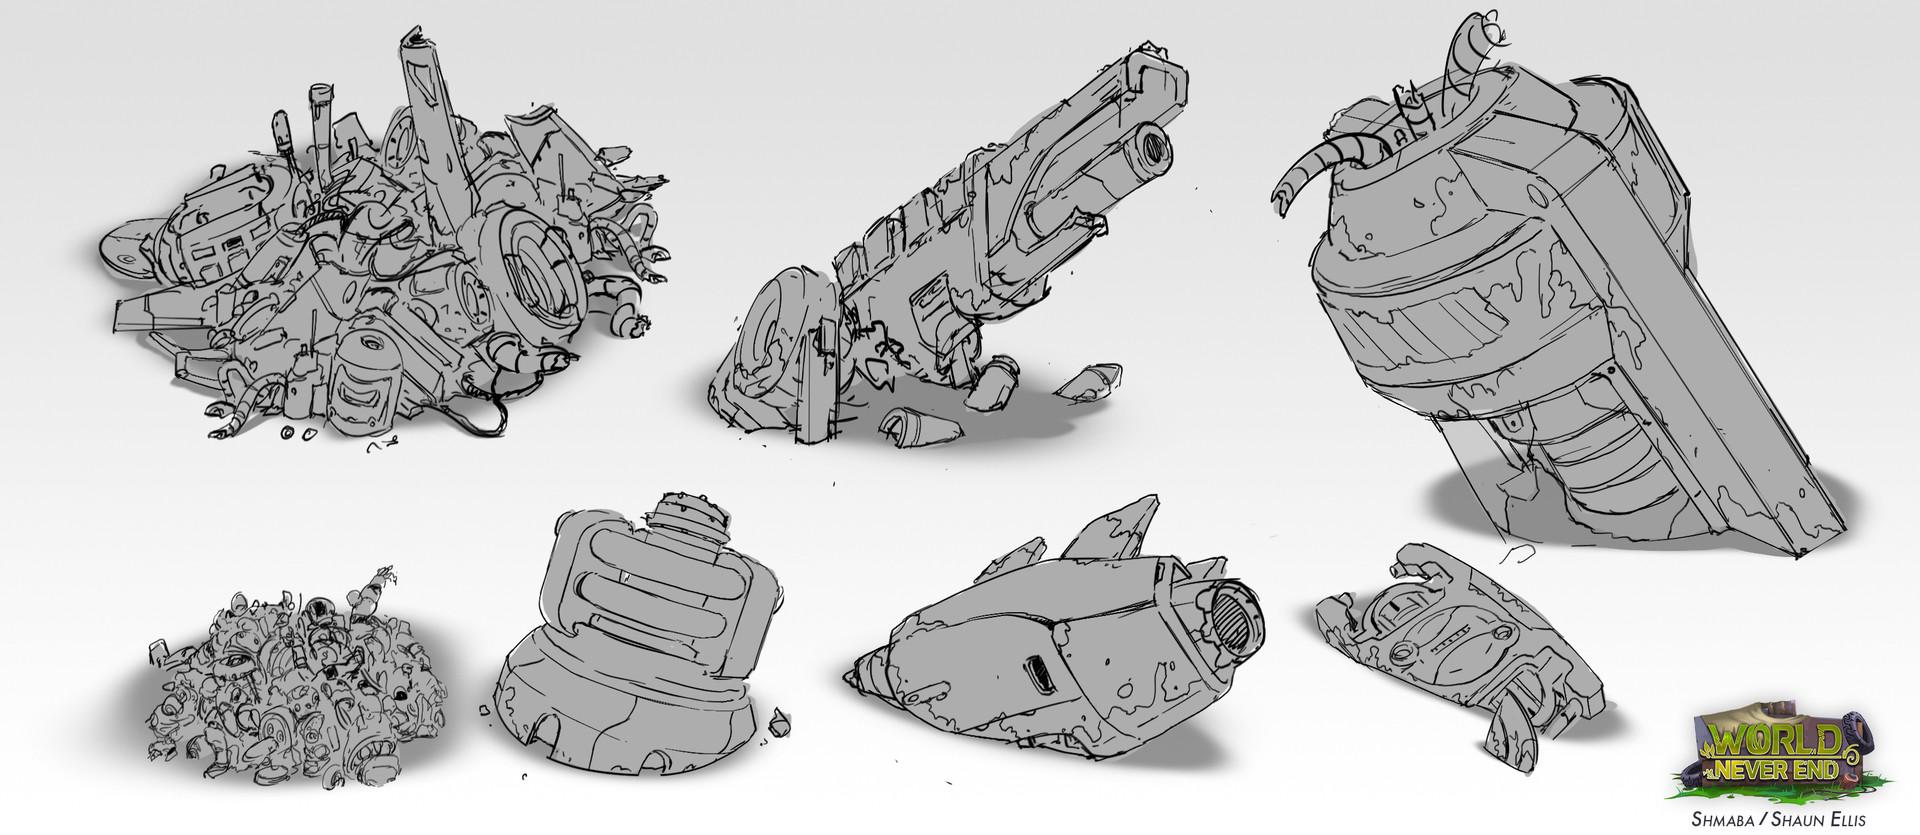 Shaun ellis concept sketchesjunk1